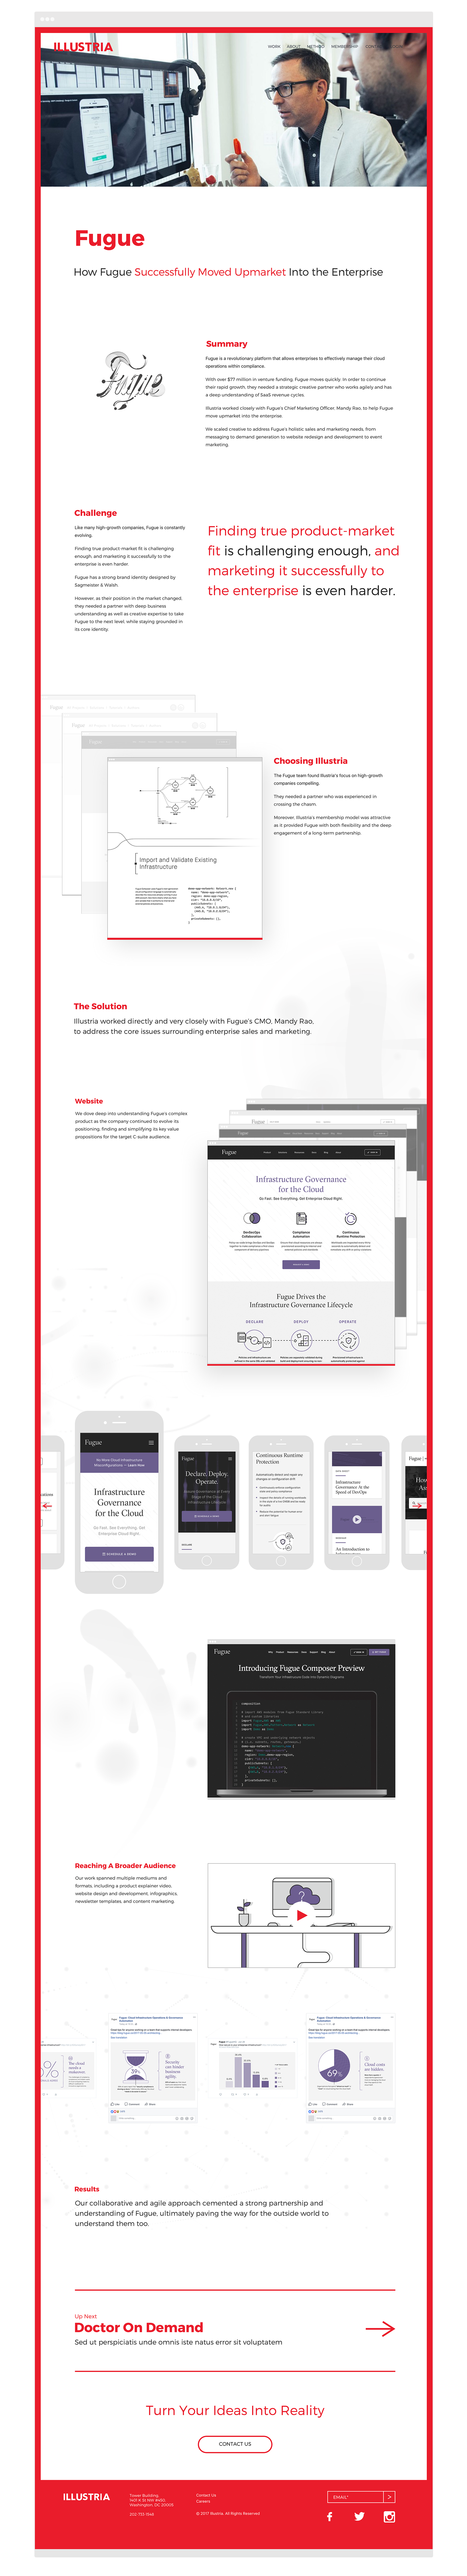 illustria-design-desktop-2-long.png